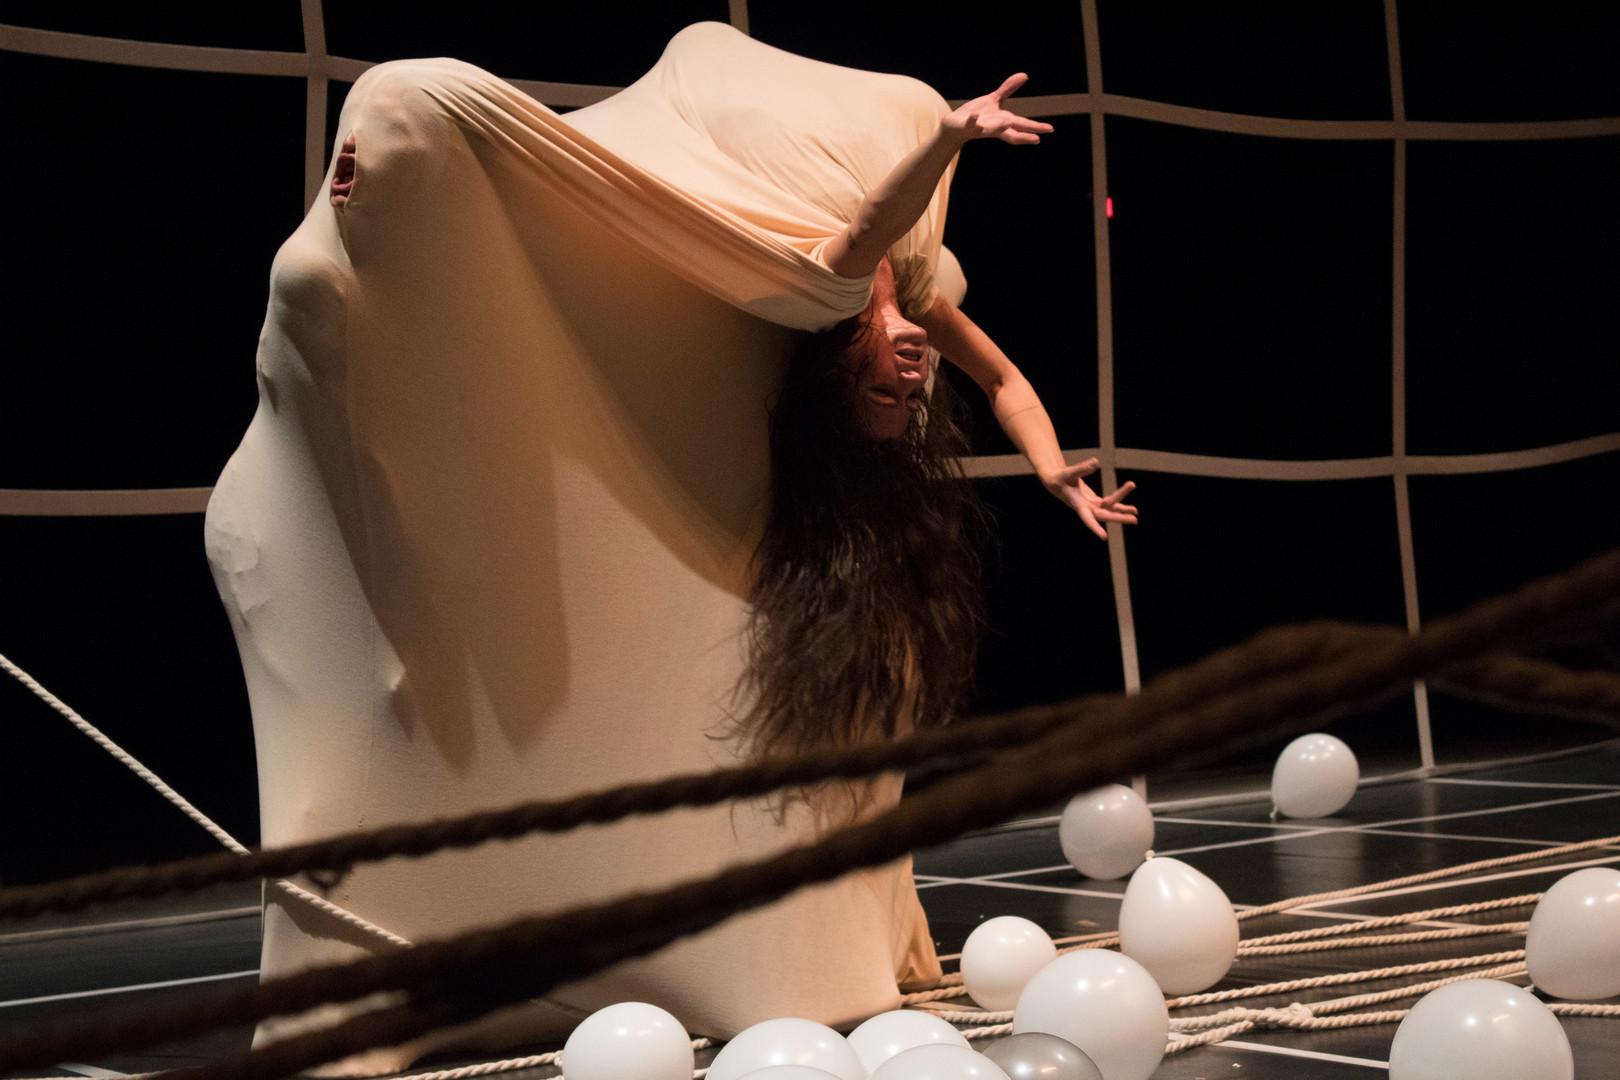 Julia Padilla Domene - La Chata - Artist